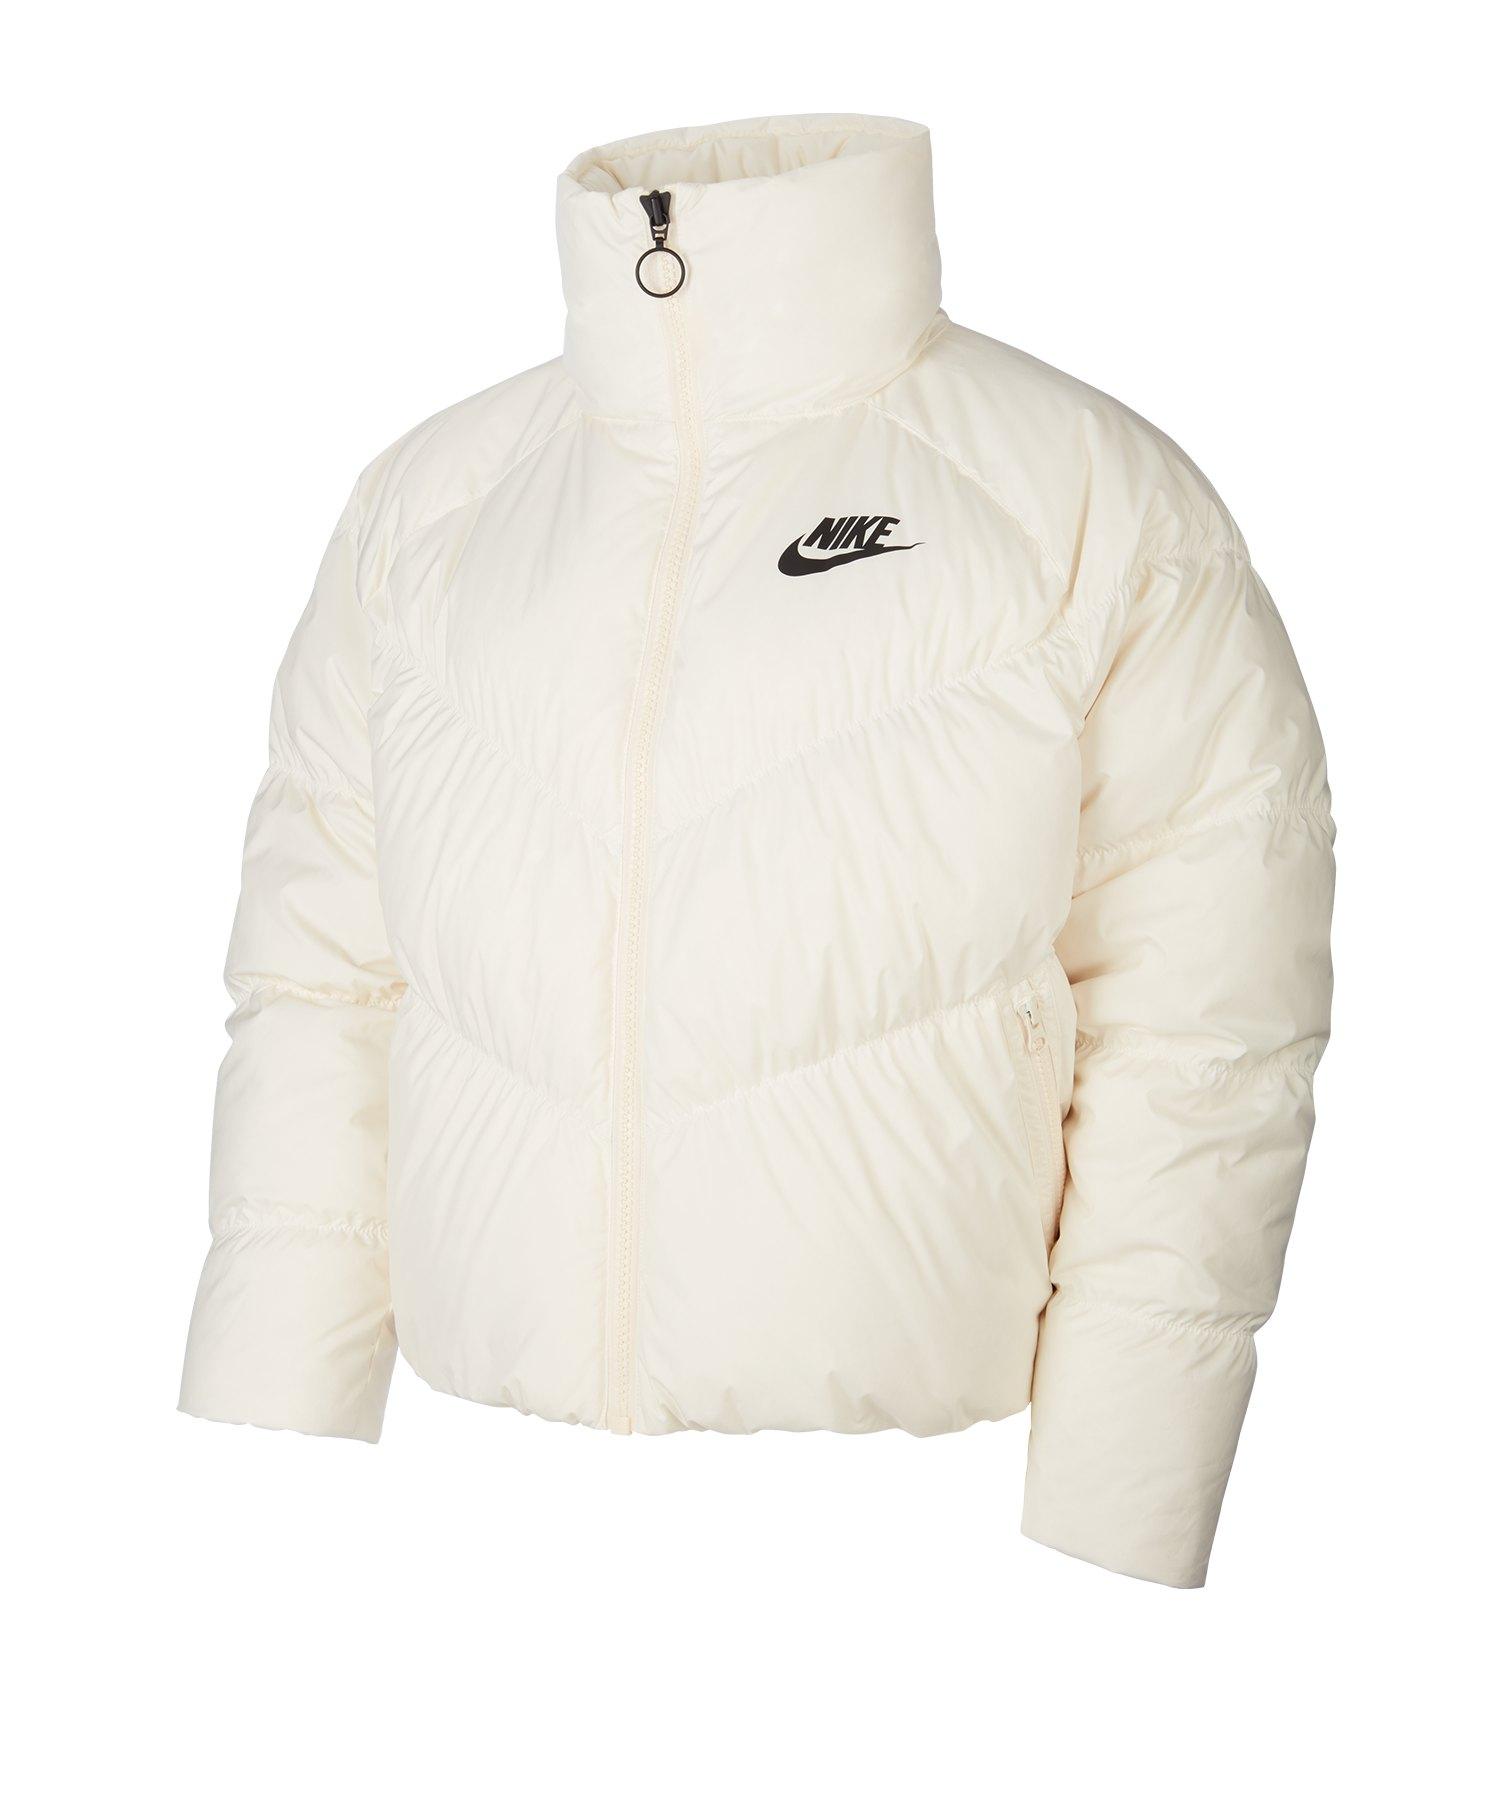 Nike Daunenjacke Damen Weiss F110 - weiss